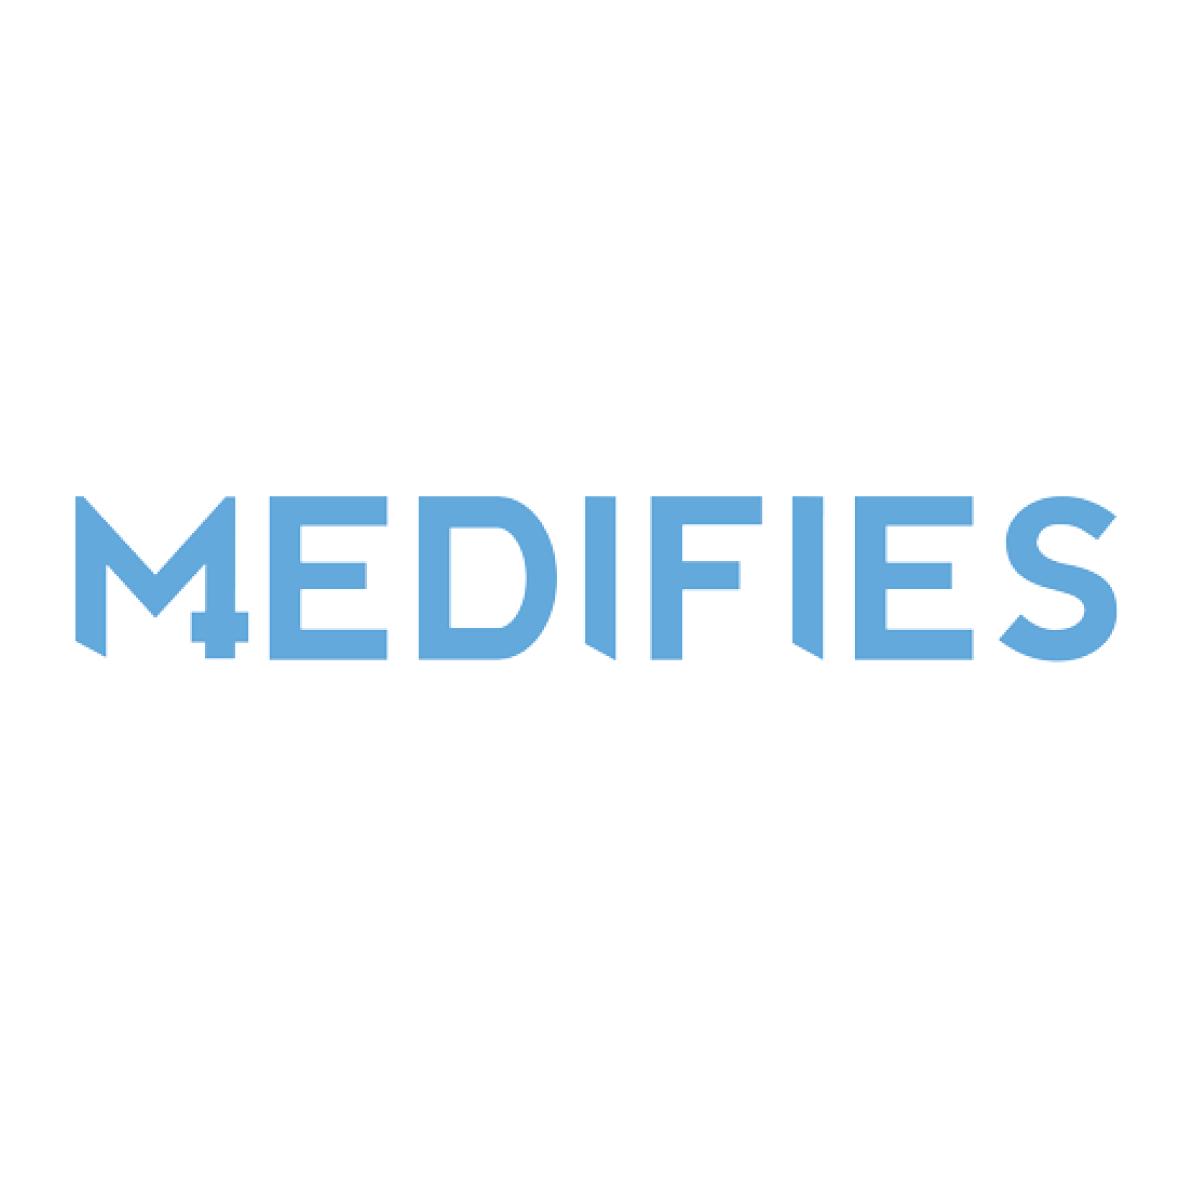 Medifies